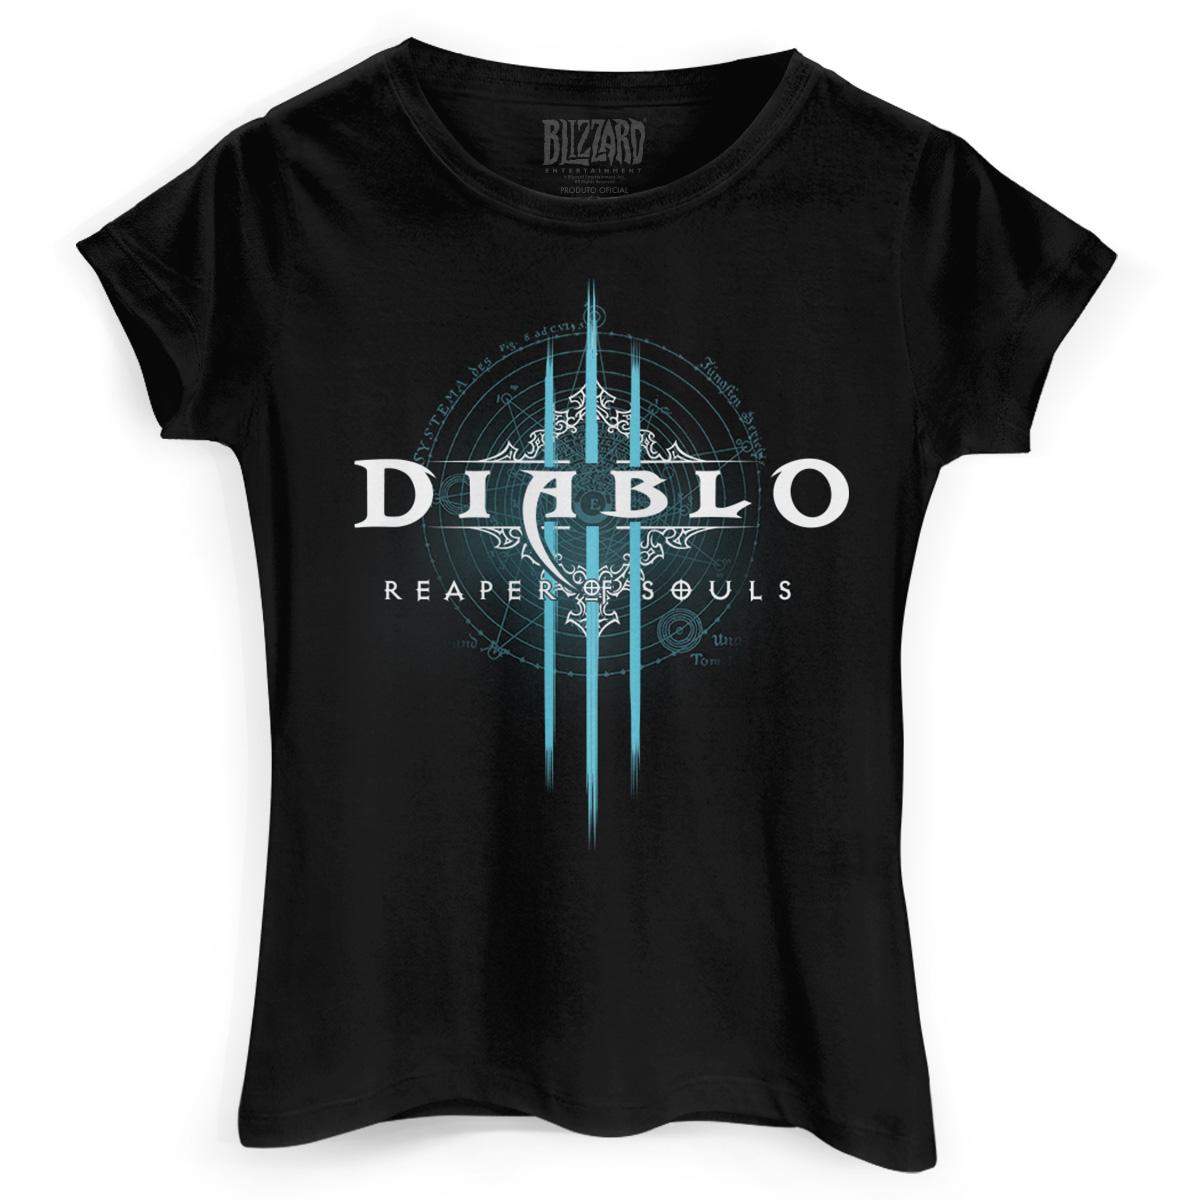 Camiseta Feminina Diablo III Reaper of Souls